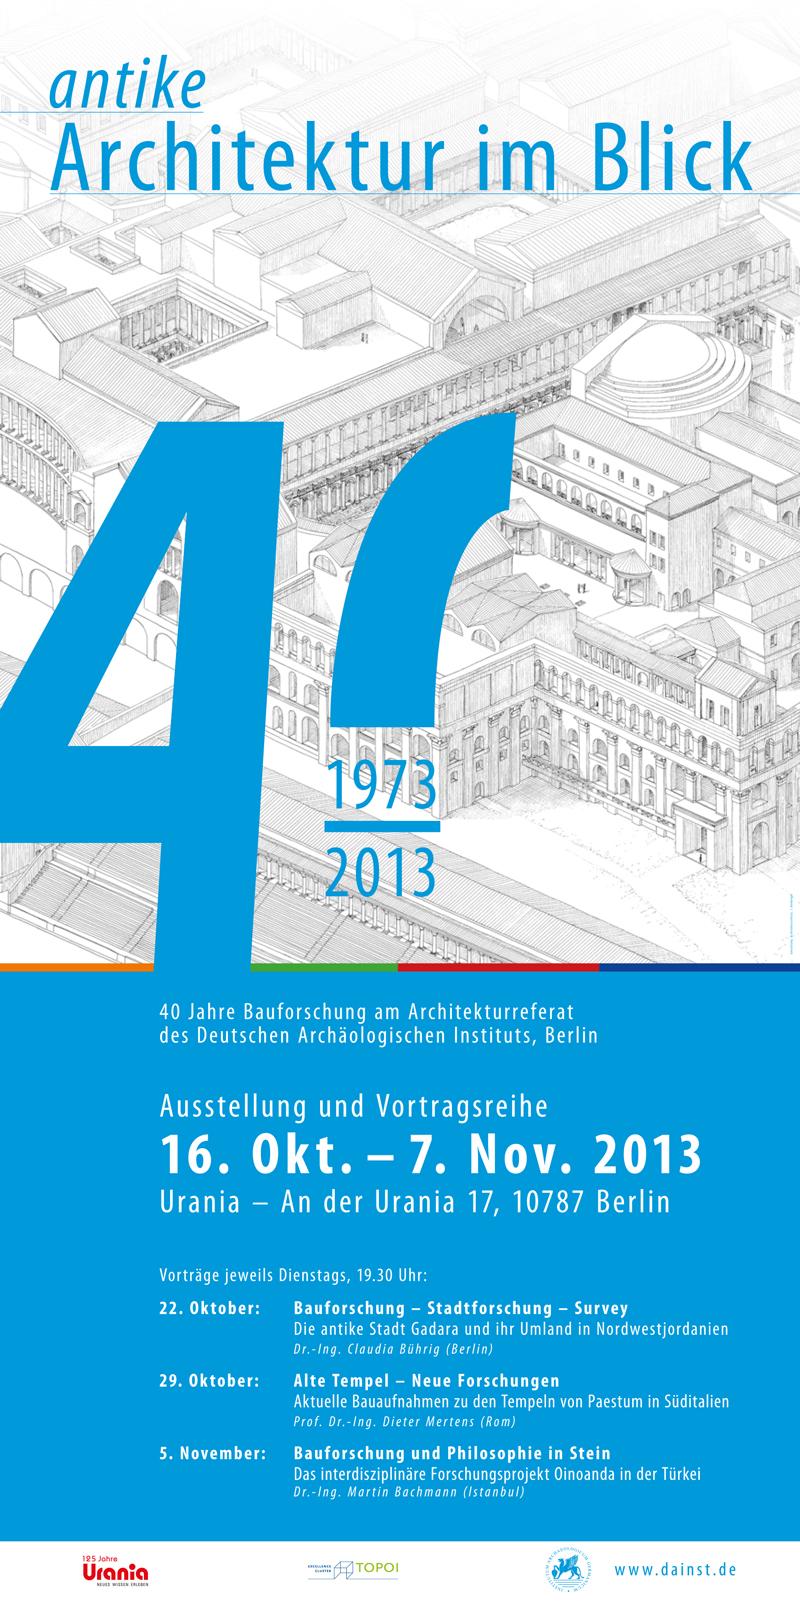 Antike Architektur im Blick | Poster